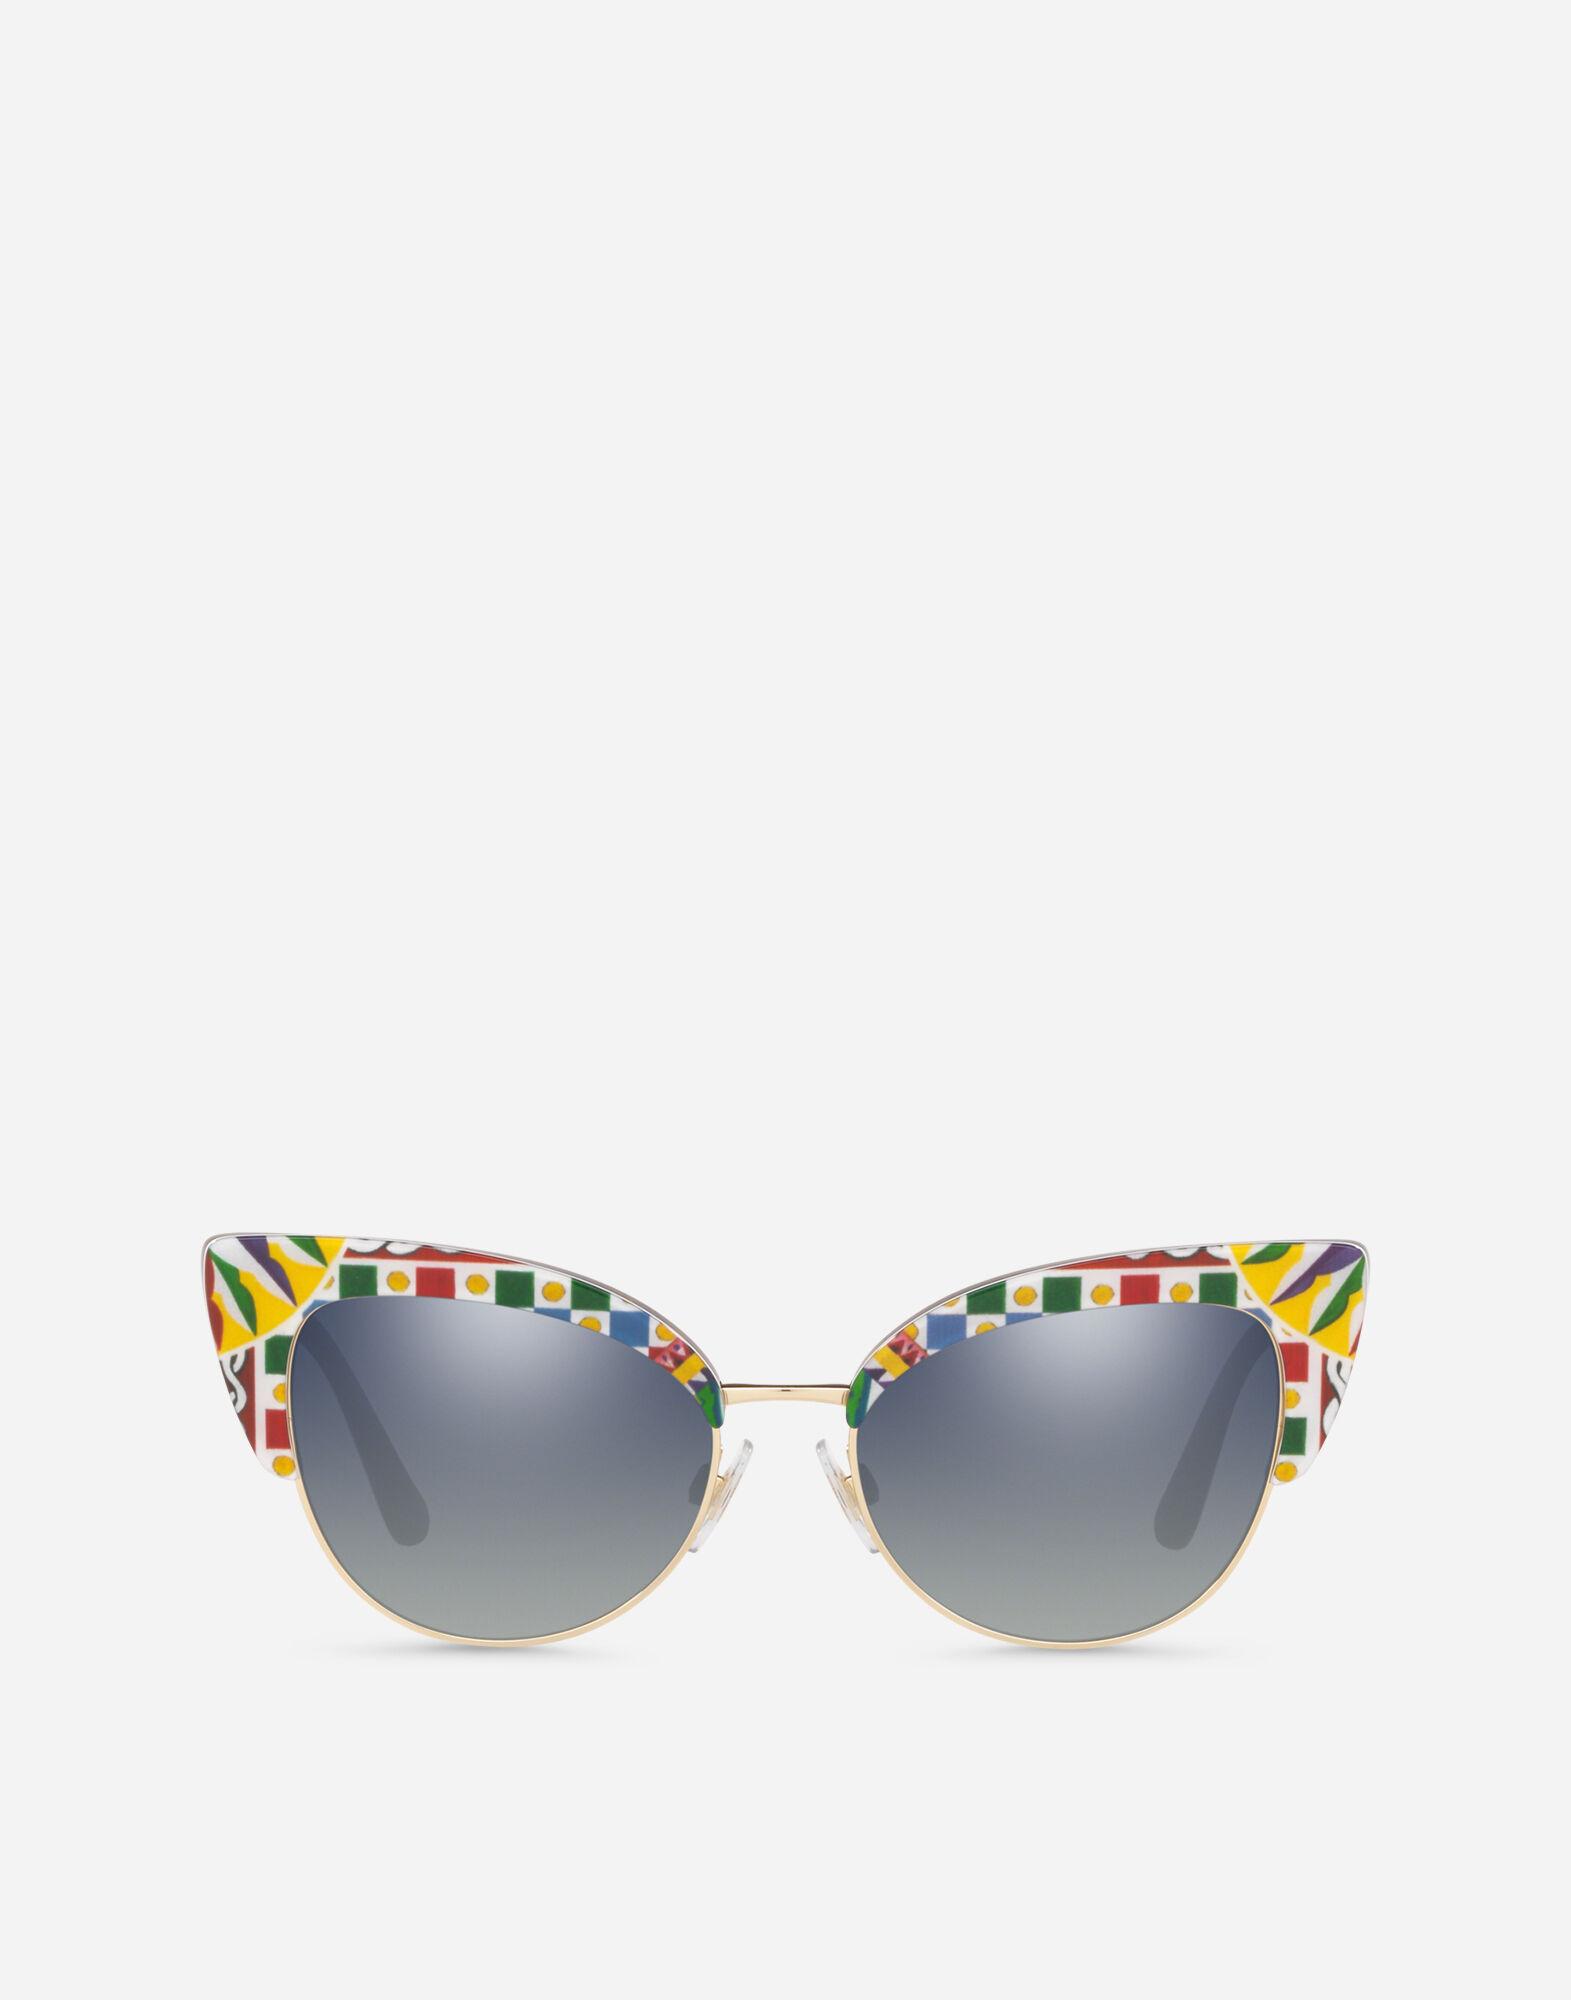 Sol MujerDolce MujerDolce Gafas Gafas Sol amp;gabbana De De Gafas amp;gabbana sQrhtd